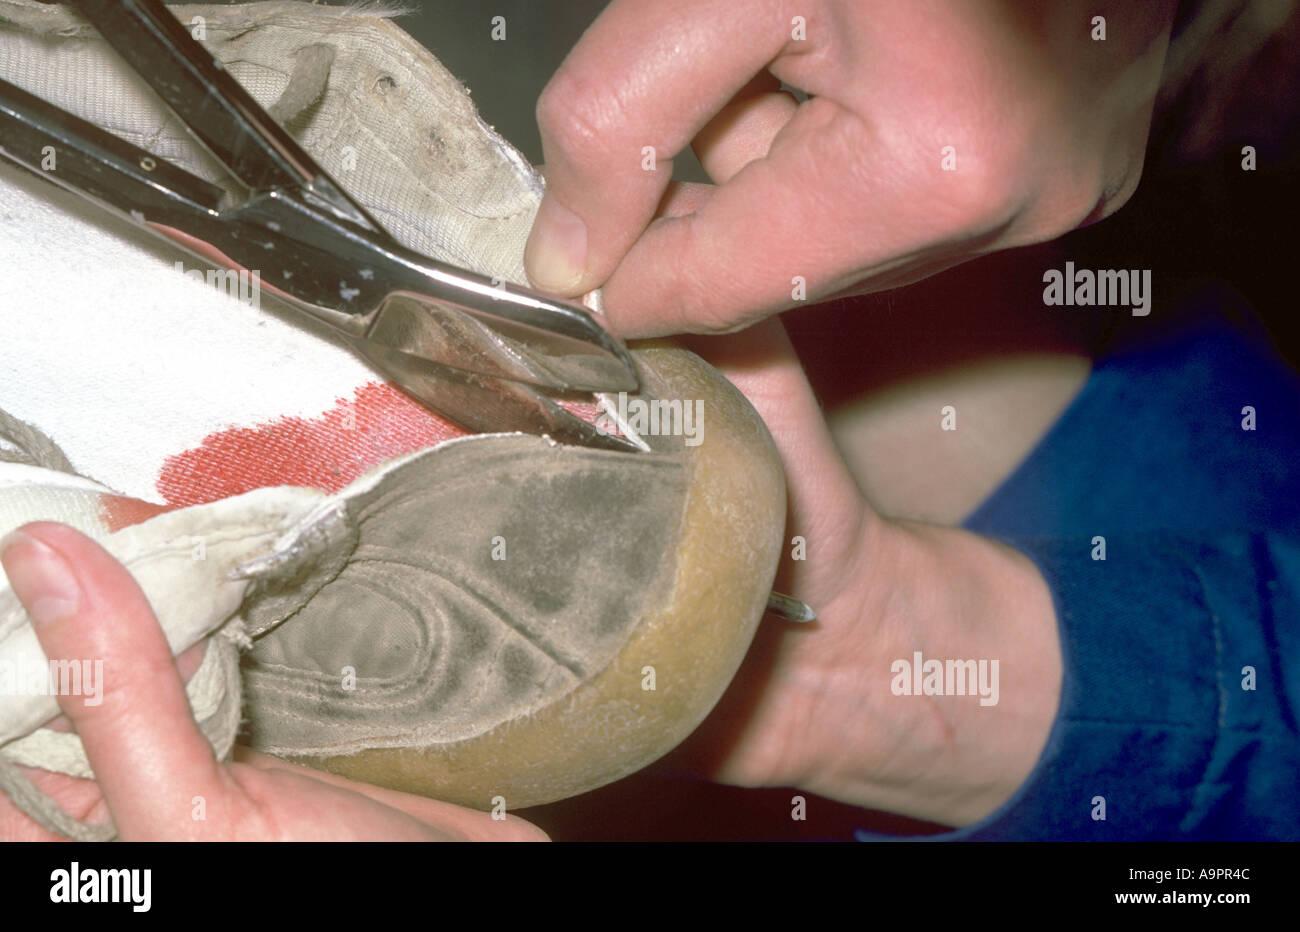 Injury to foot nail Stock Photo: 4054859 - Alamy